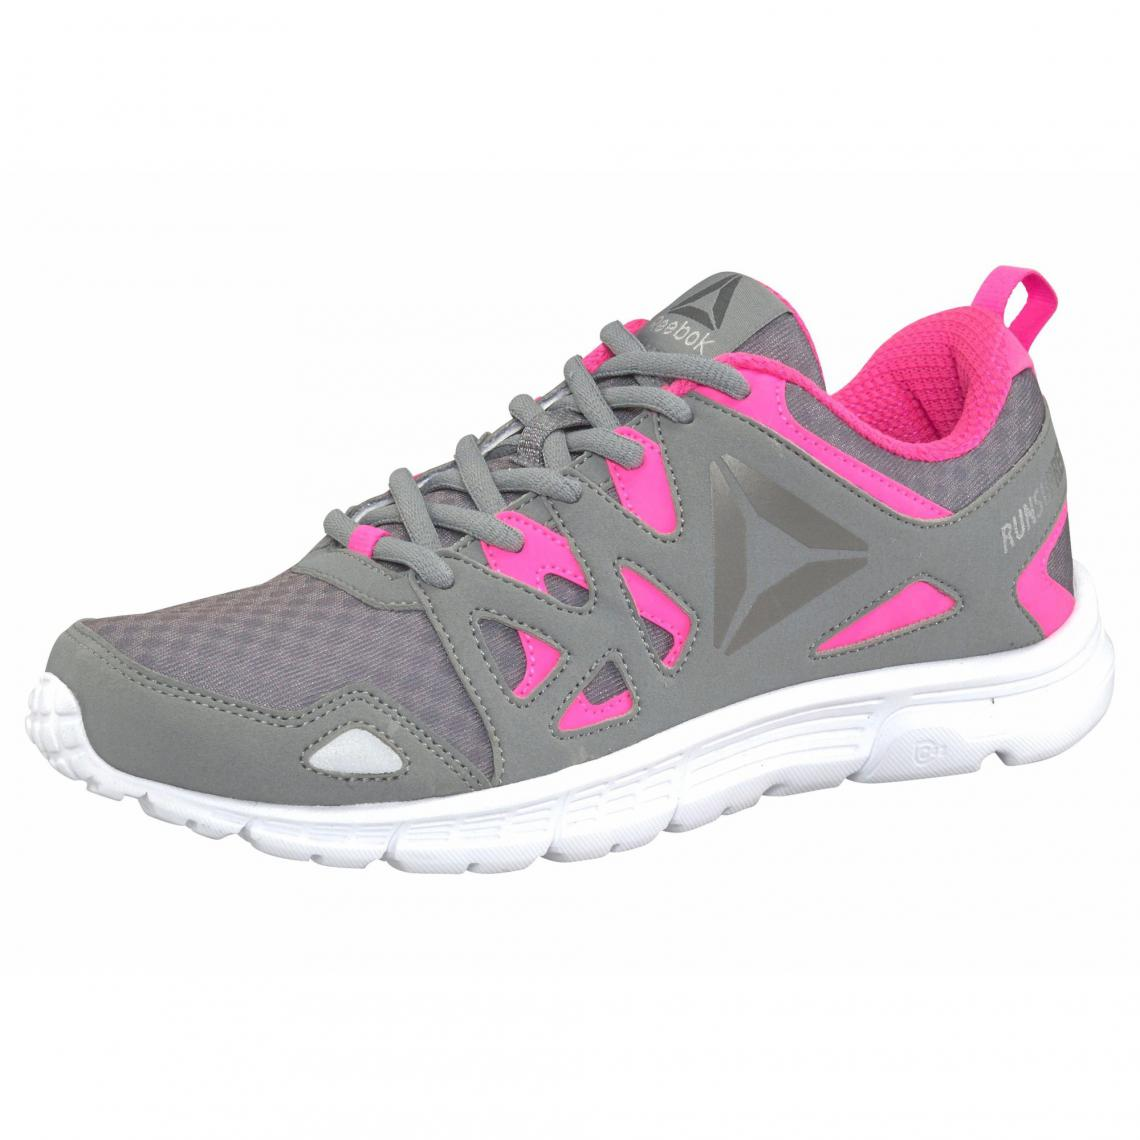 wholesale dealer c4fd0 a5066 Sneaker femme Run Supreme 3.0 Wmn Reebok - Gris - Rose Vif Reebok Femme